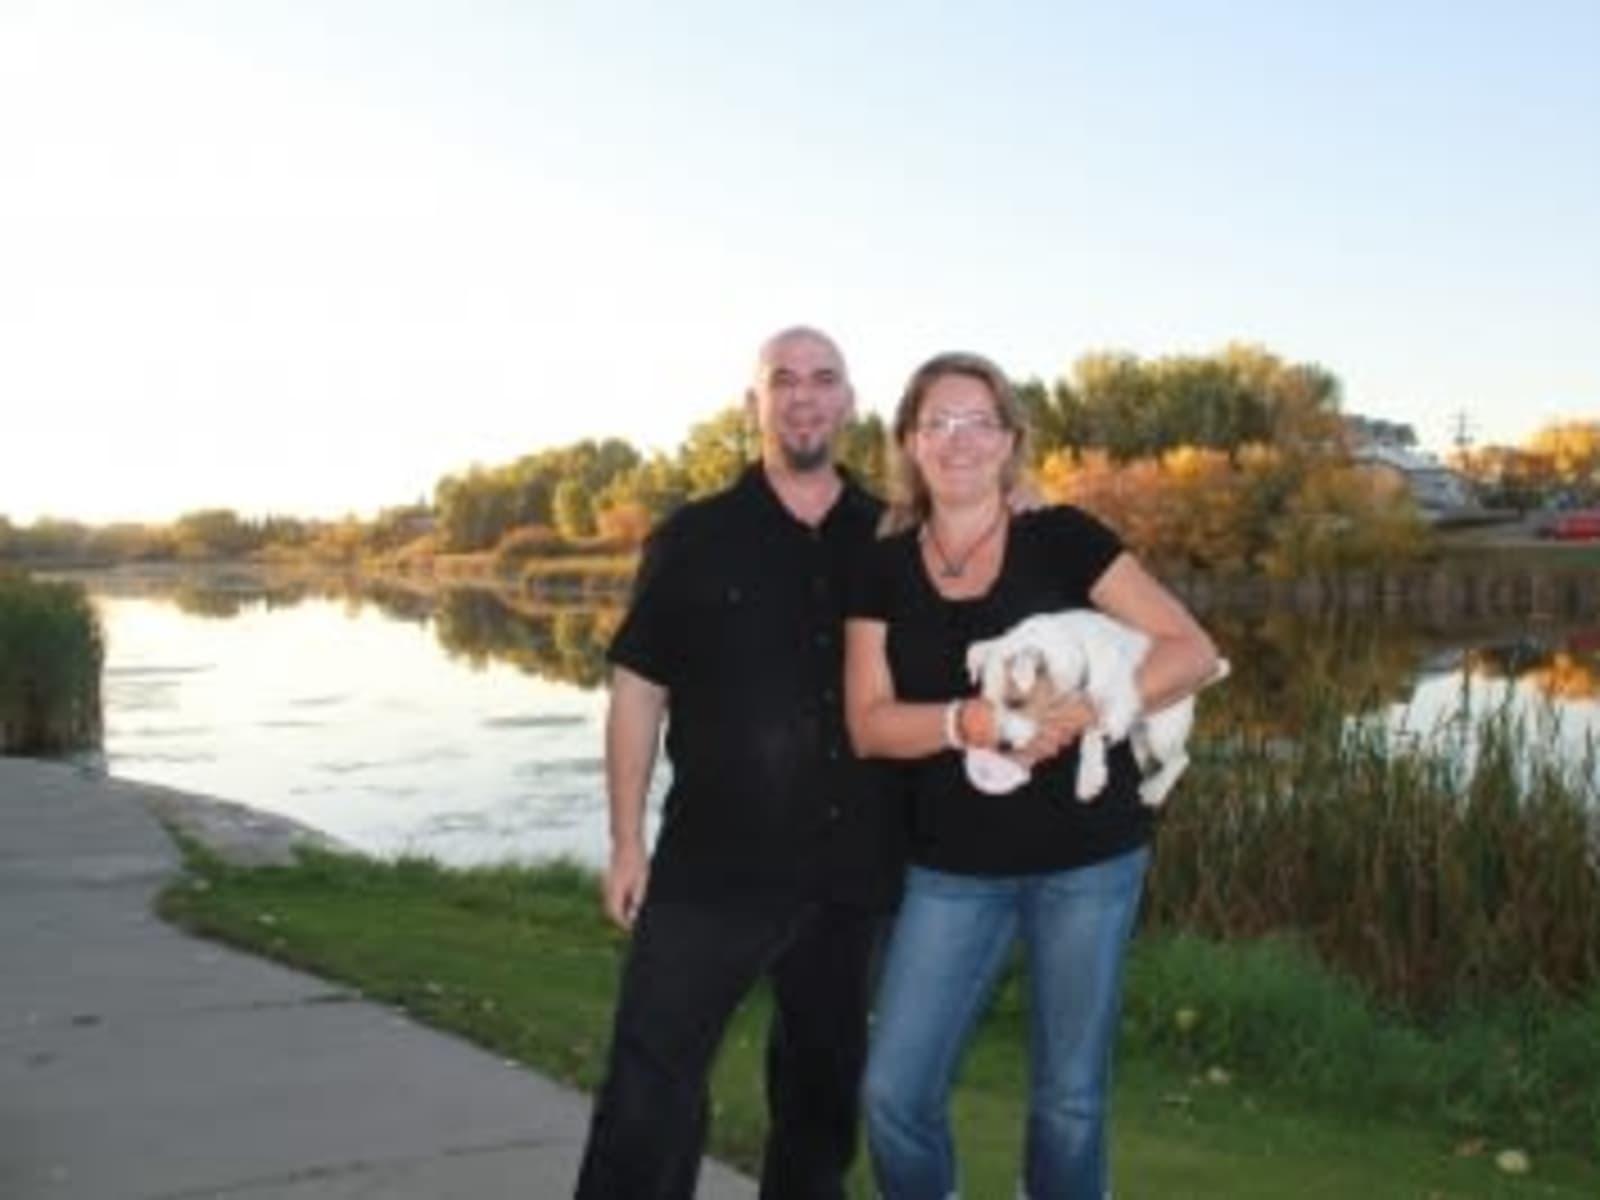 Barbara & Shawn from Calgary, Alberta, Canada